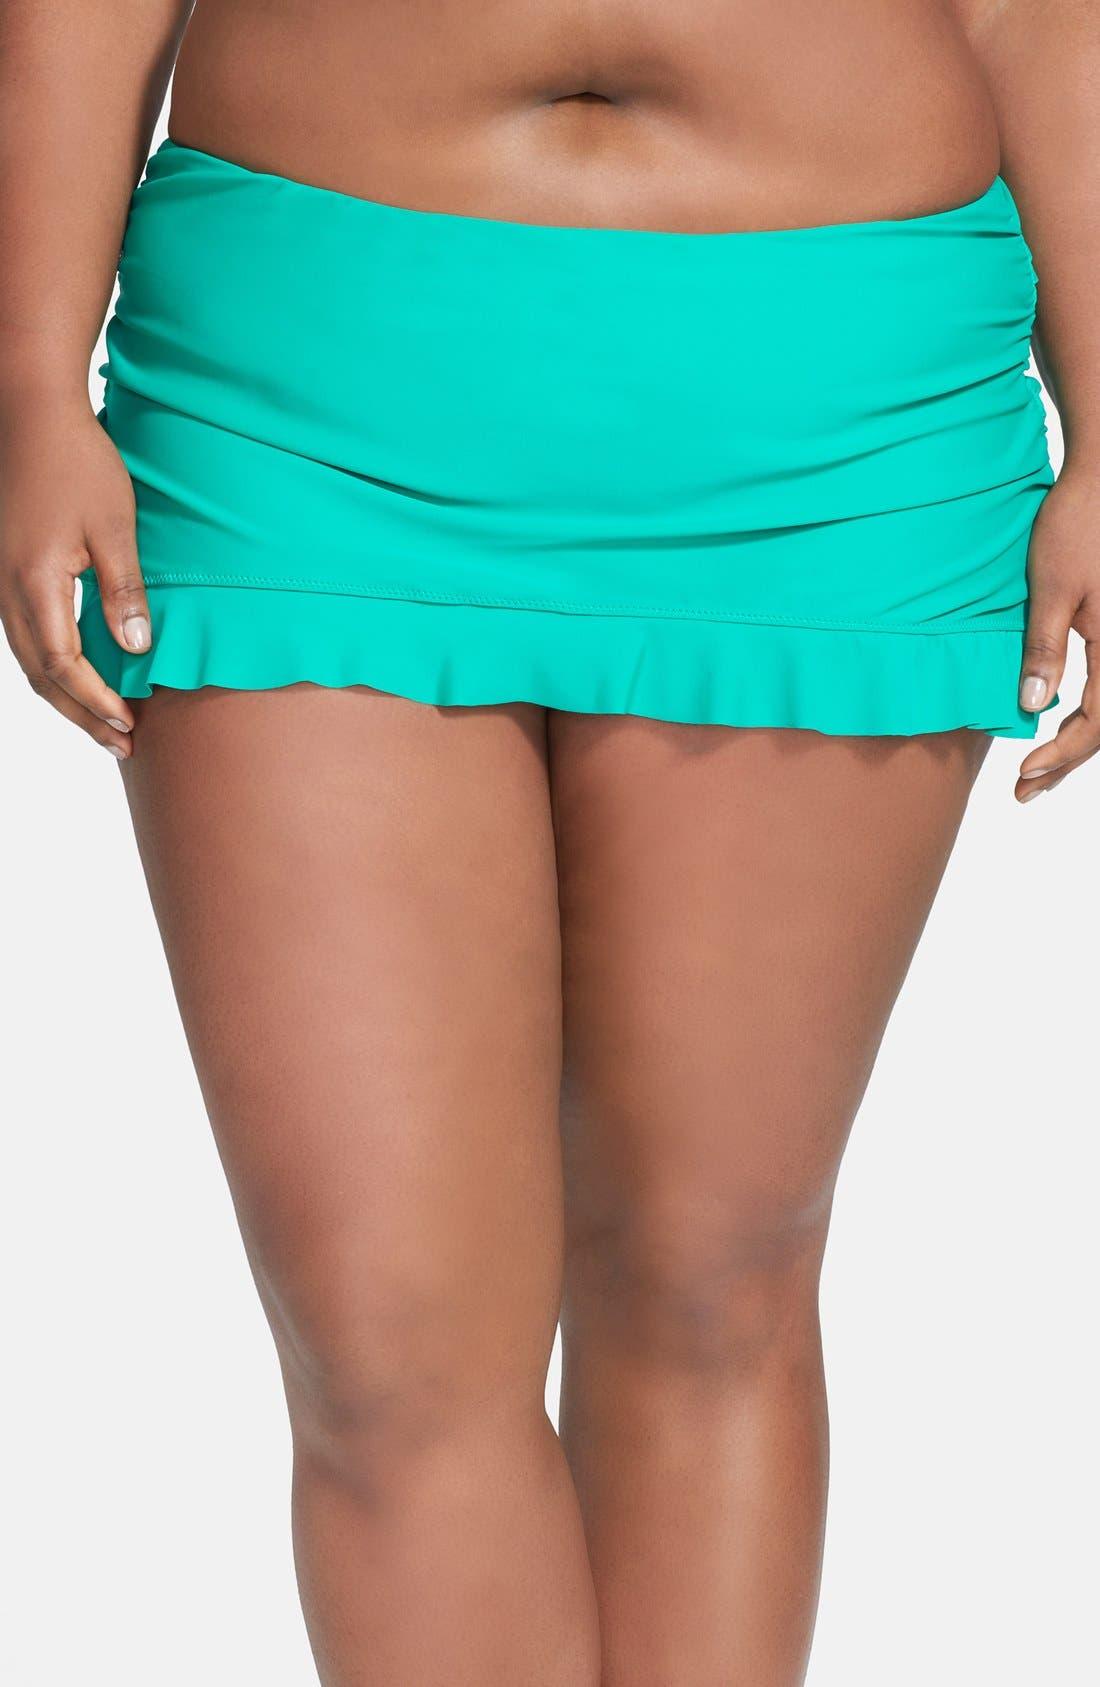 Alternate Image 1 Selected - Jessica Simpson Skirted Swim Bottoms (Plus Size)